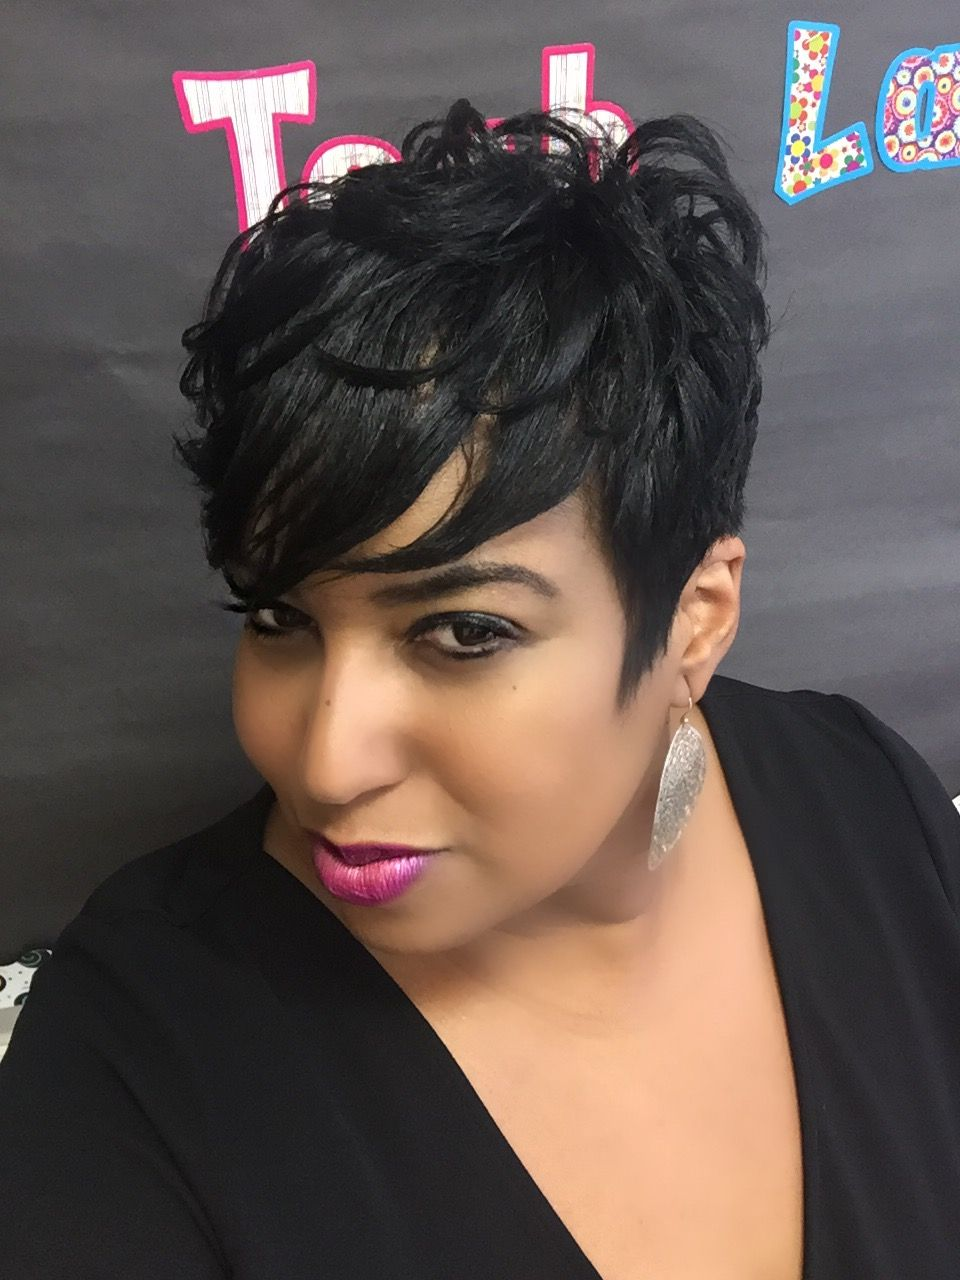 Spice Hair Salon Shemicka | Hair that I LOVE!!!!! in 2019 ...